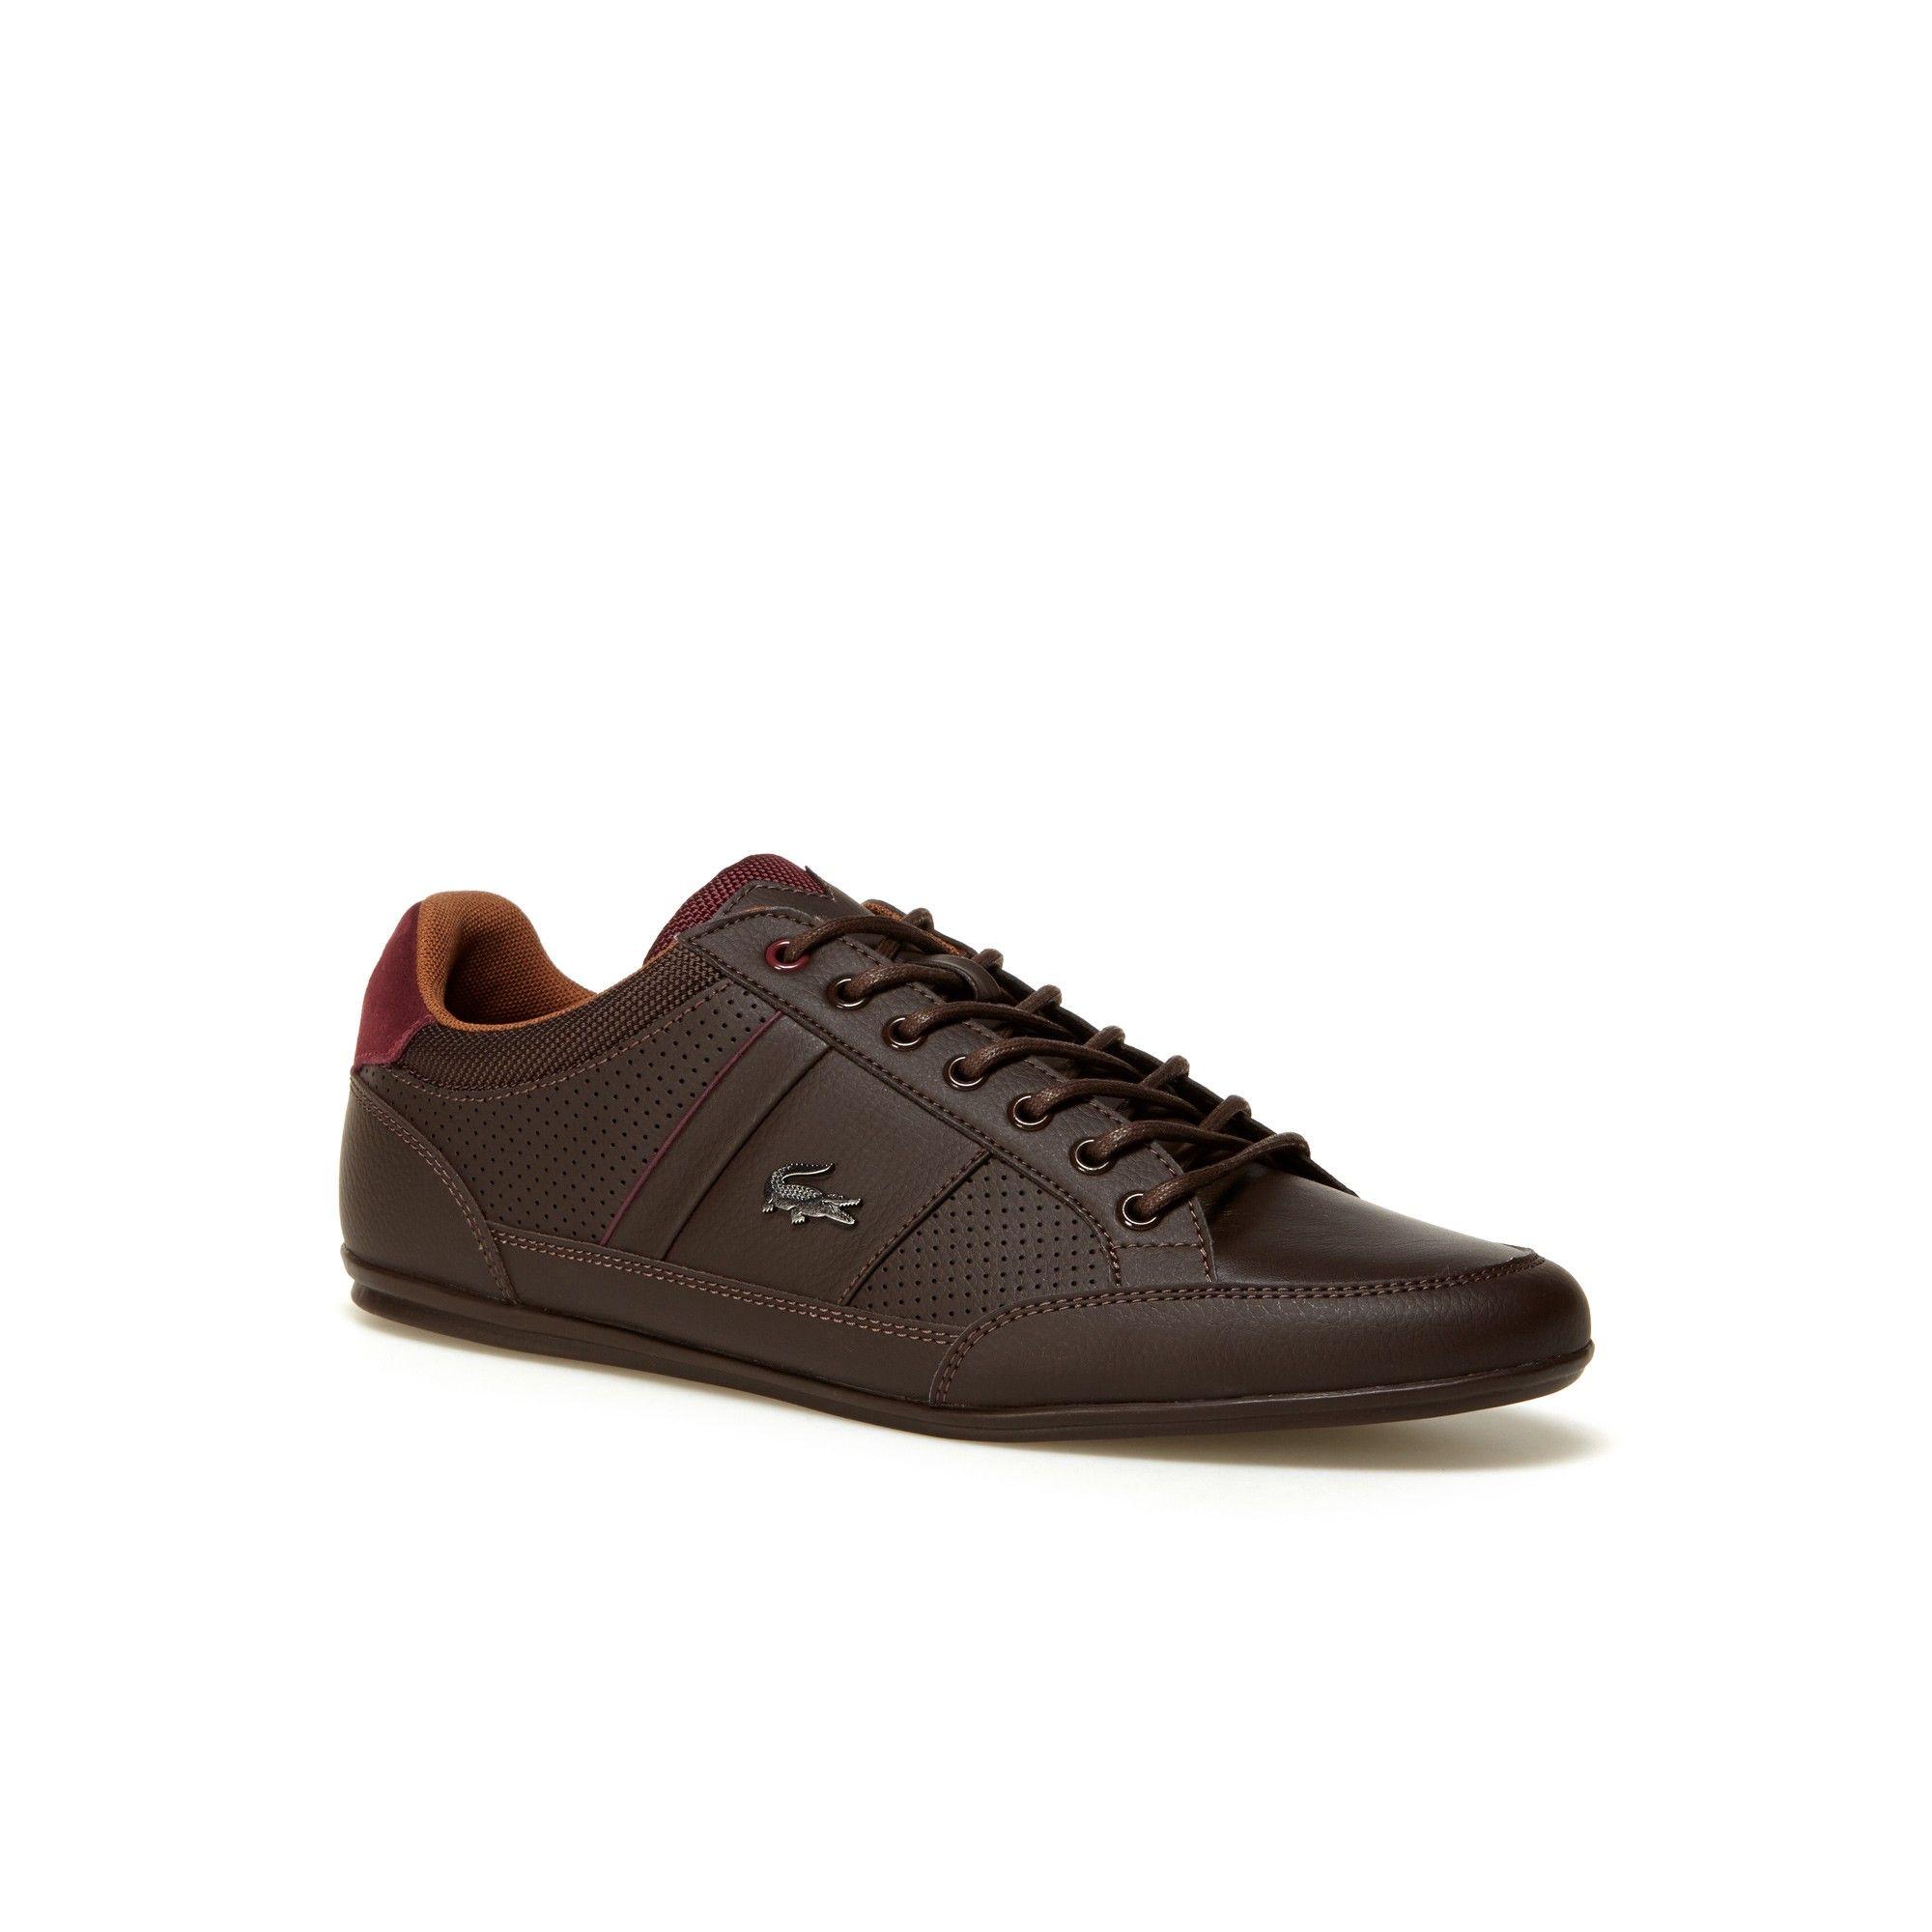 068d6180c LACOSTE Men s Chaymon Leather Sneakers - dark brown tan.  lacoste  shoes